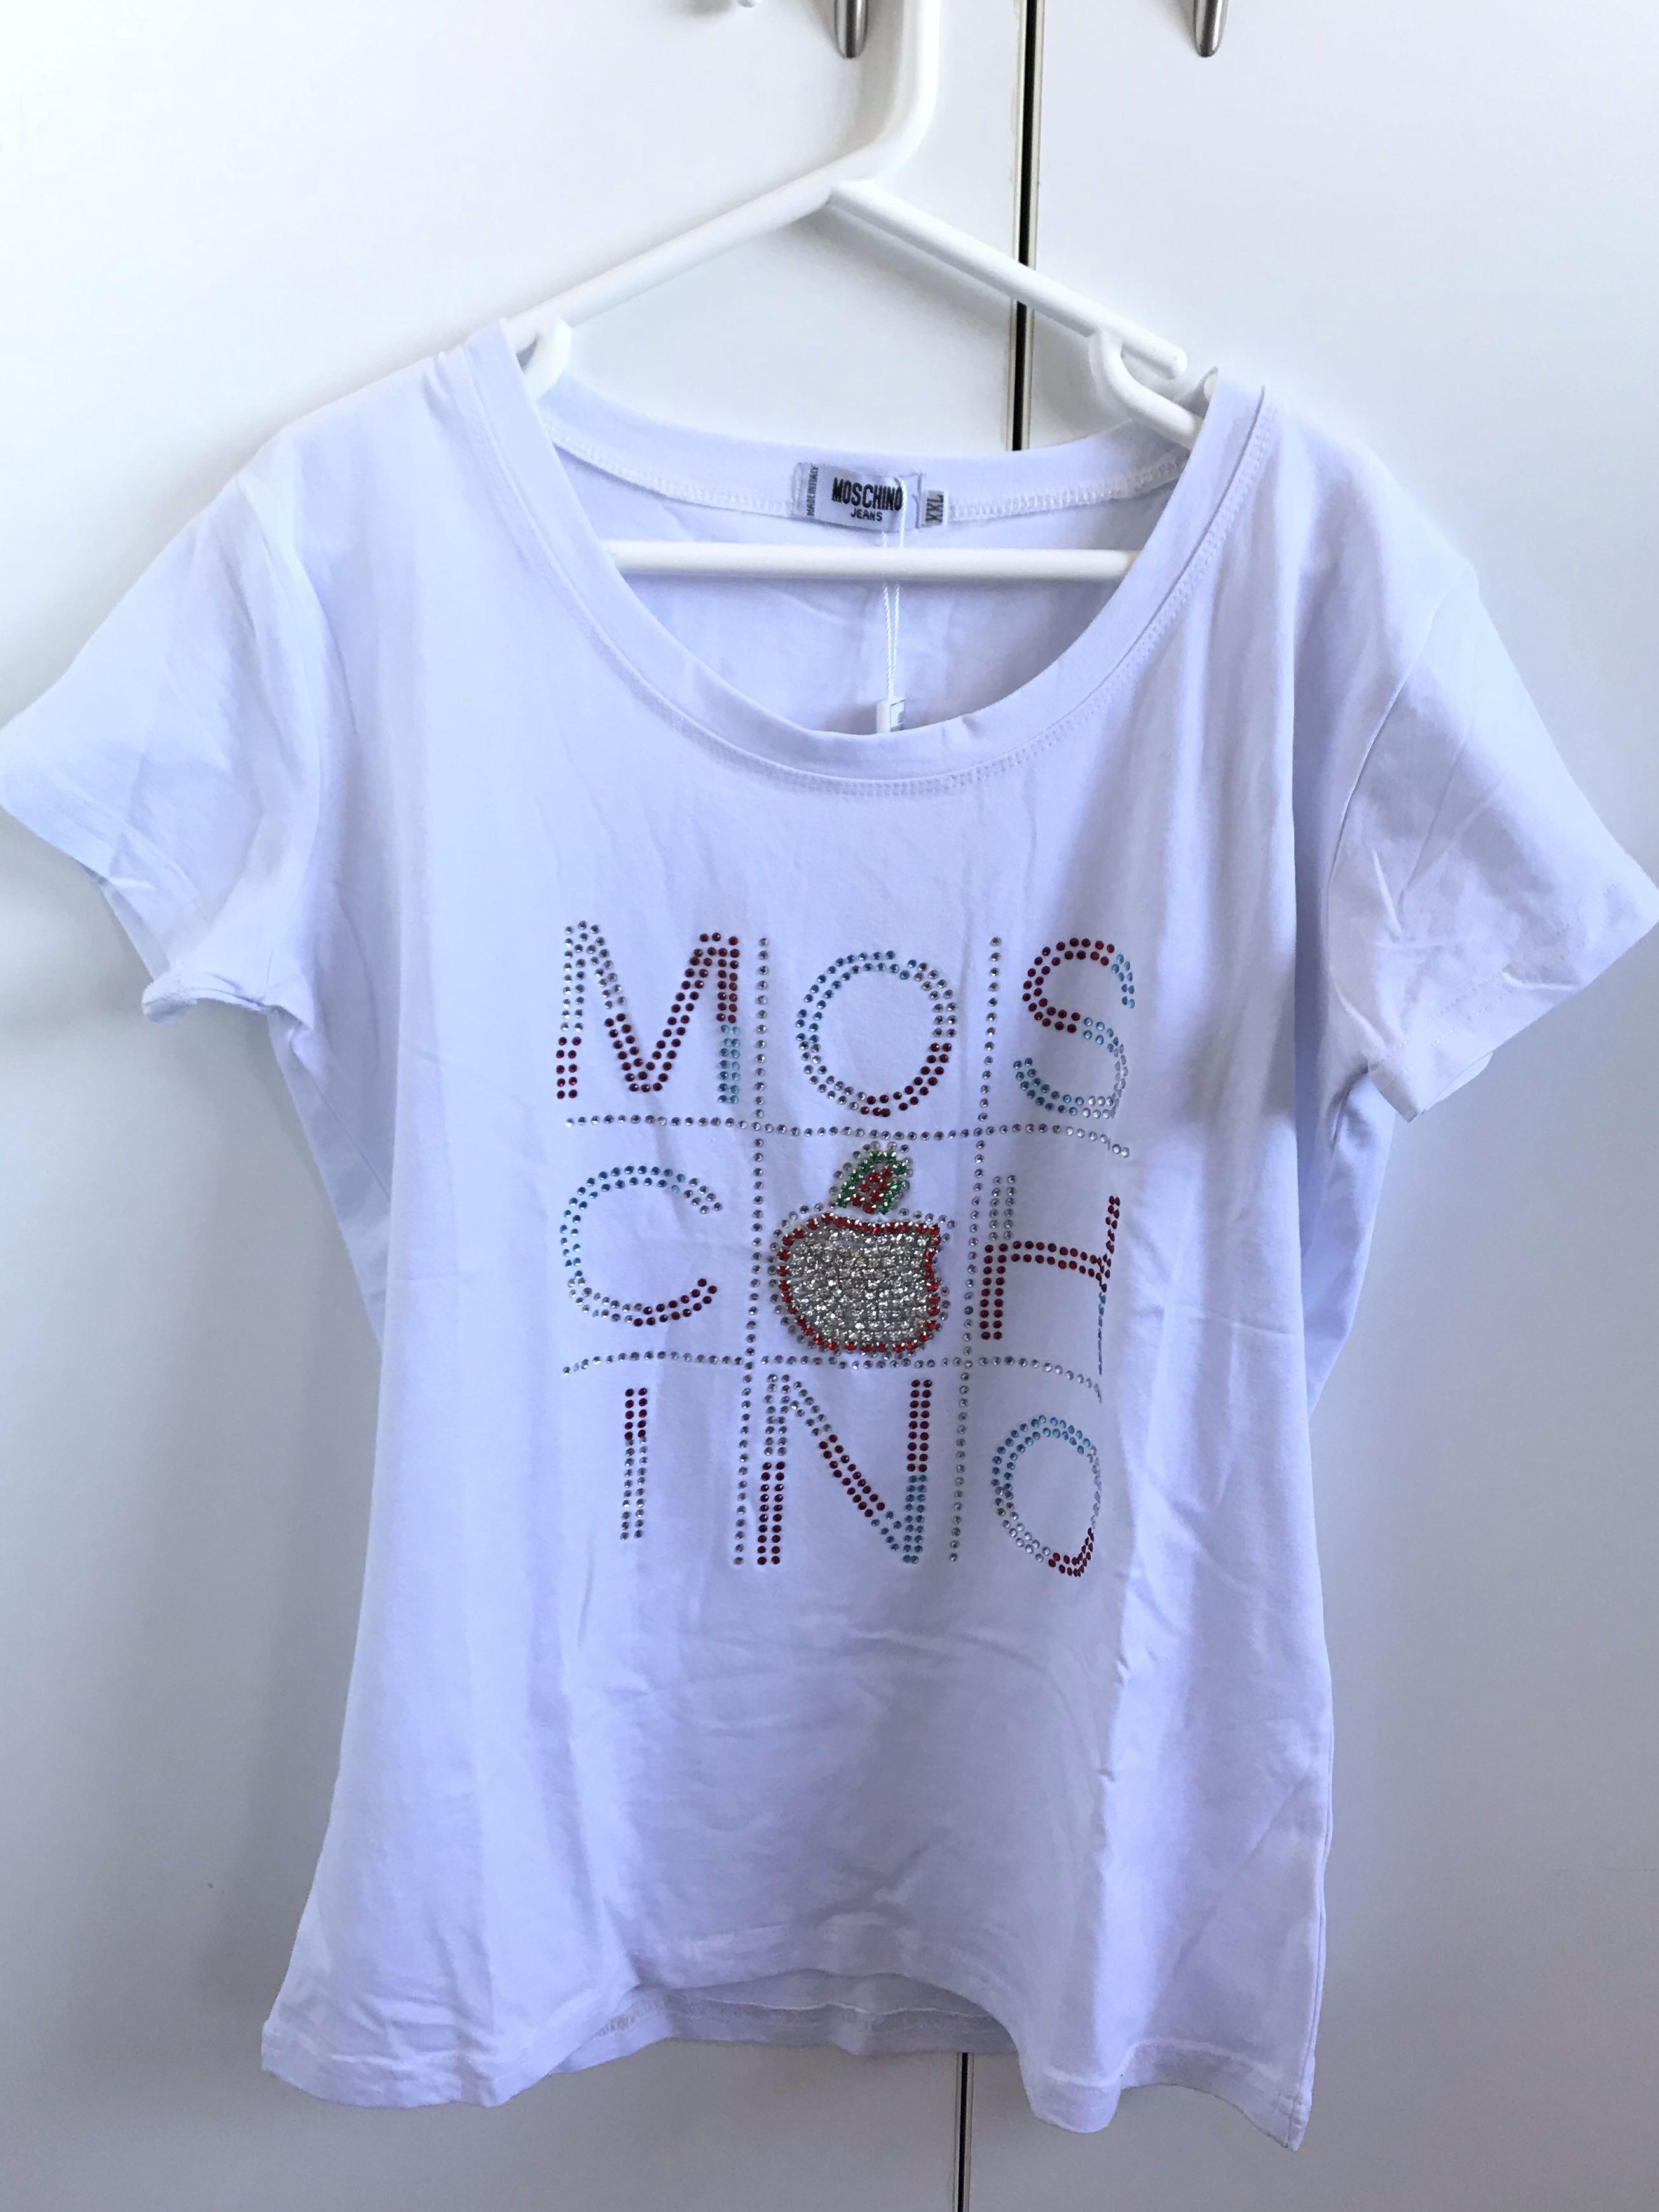 Moschino sparkle gemstone print logo white shirt size small